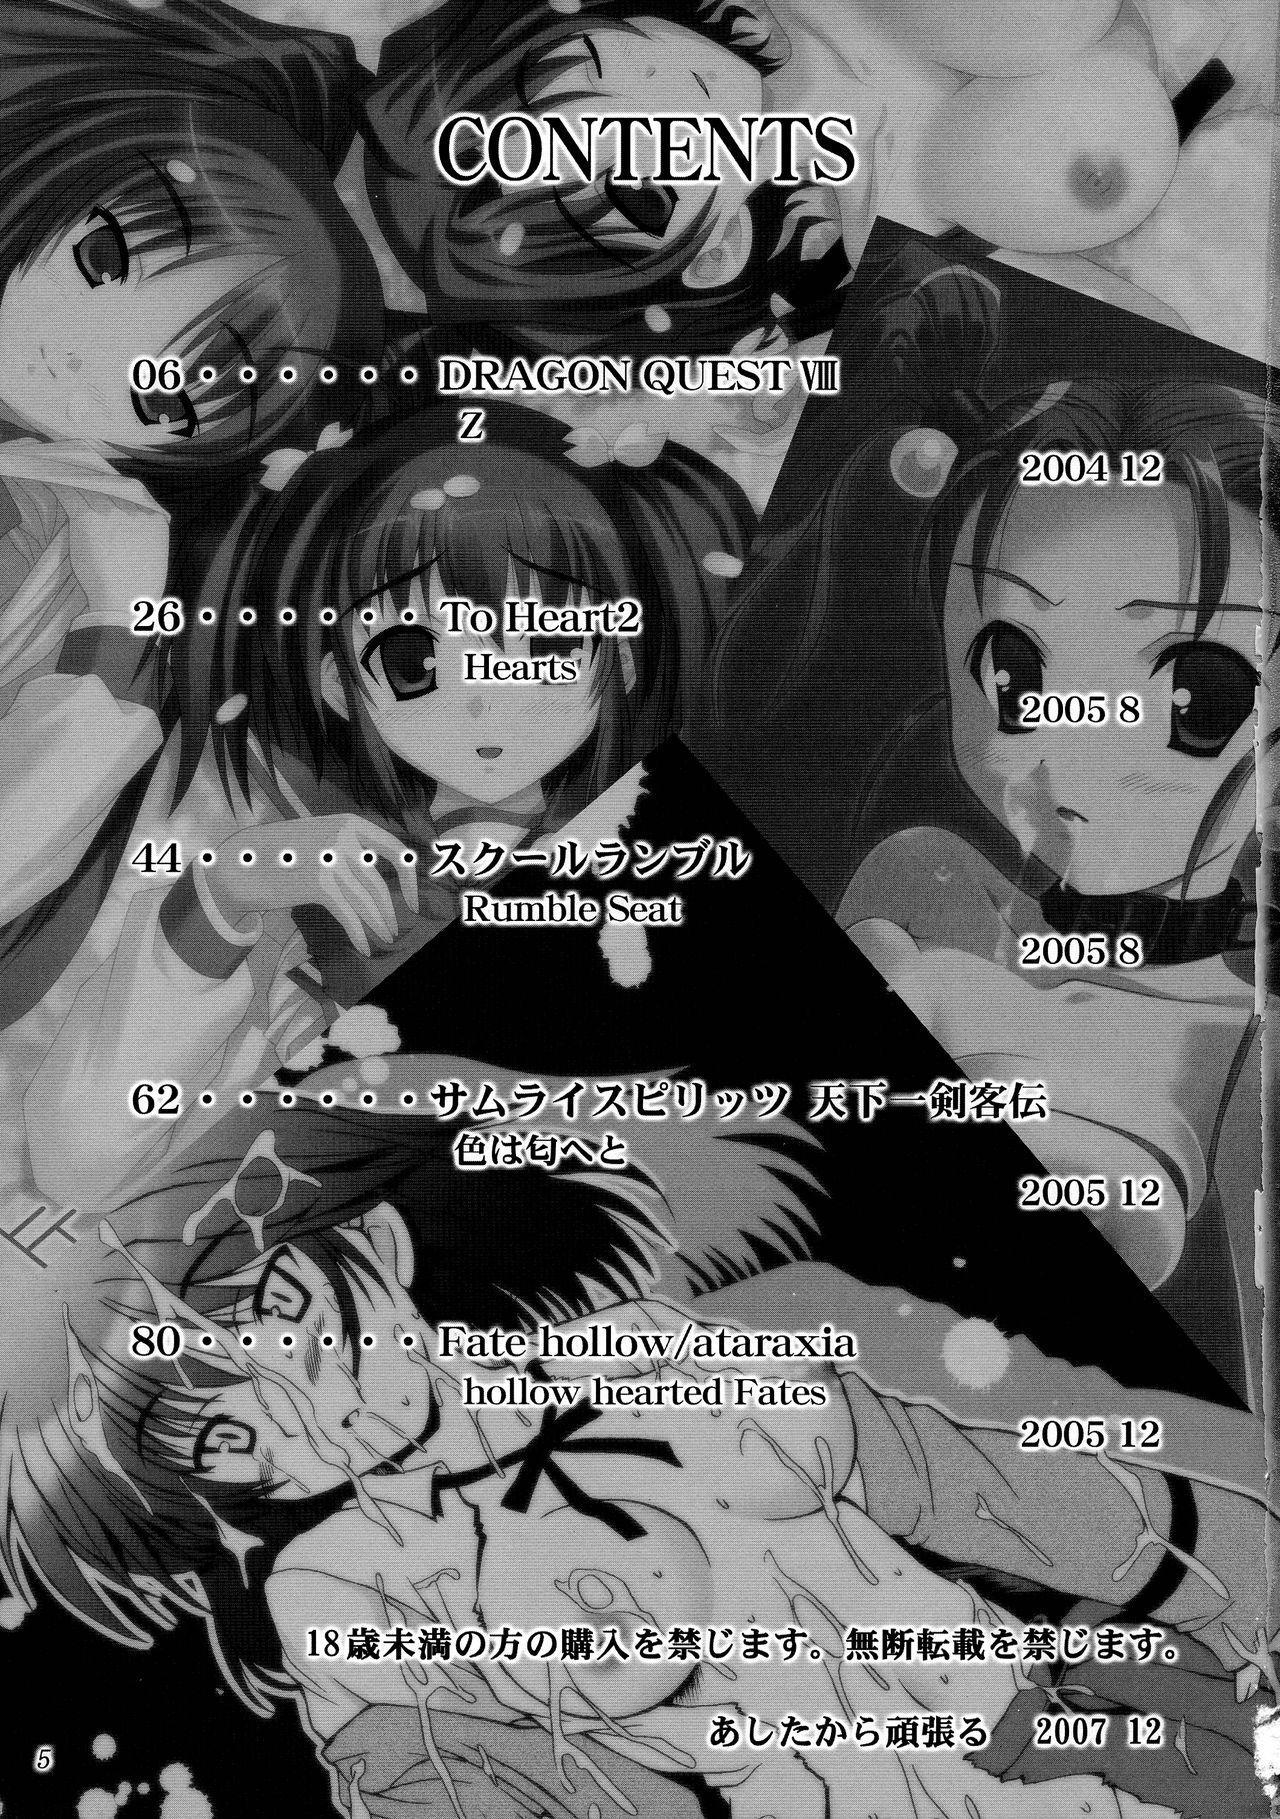 (C73) [ashitakara-ganbaru (Yameta Takashi)] ZIG-ZIG-ZIG 3 -2004~2005- (Various) 4